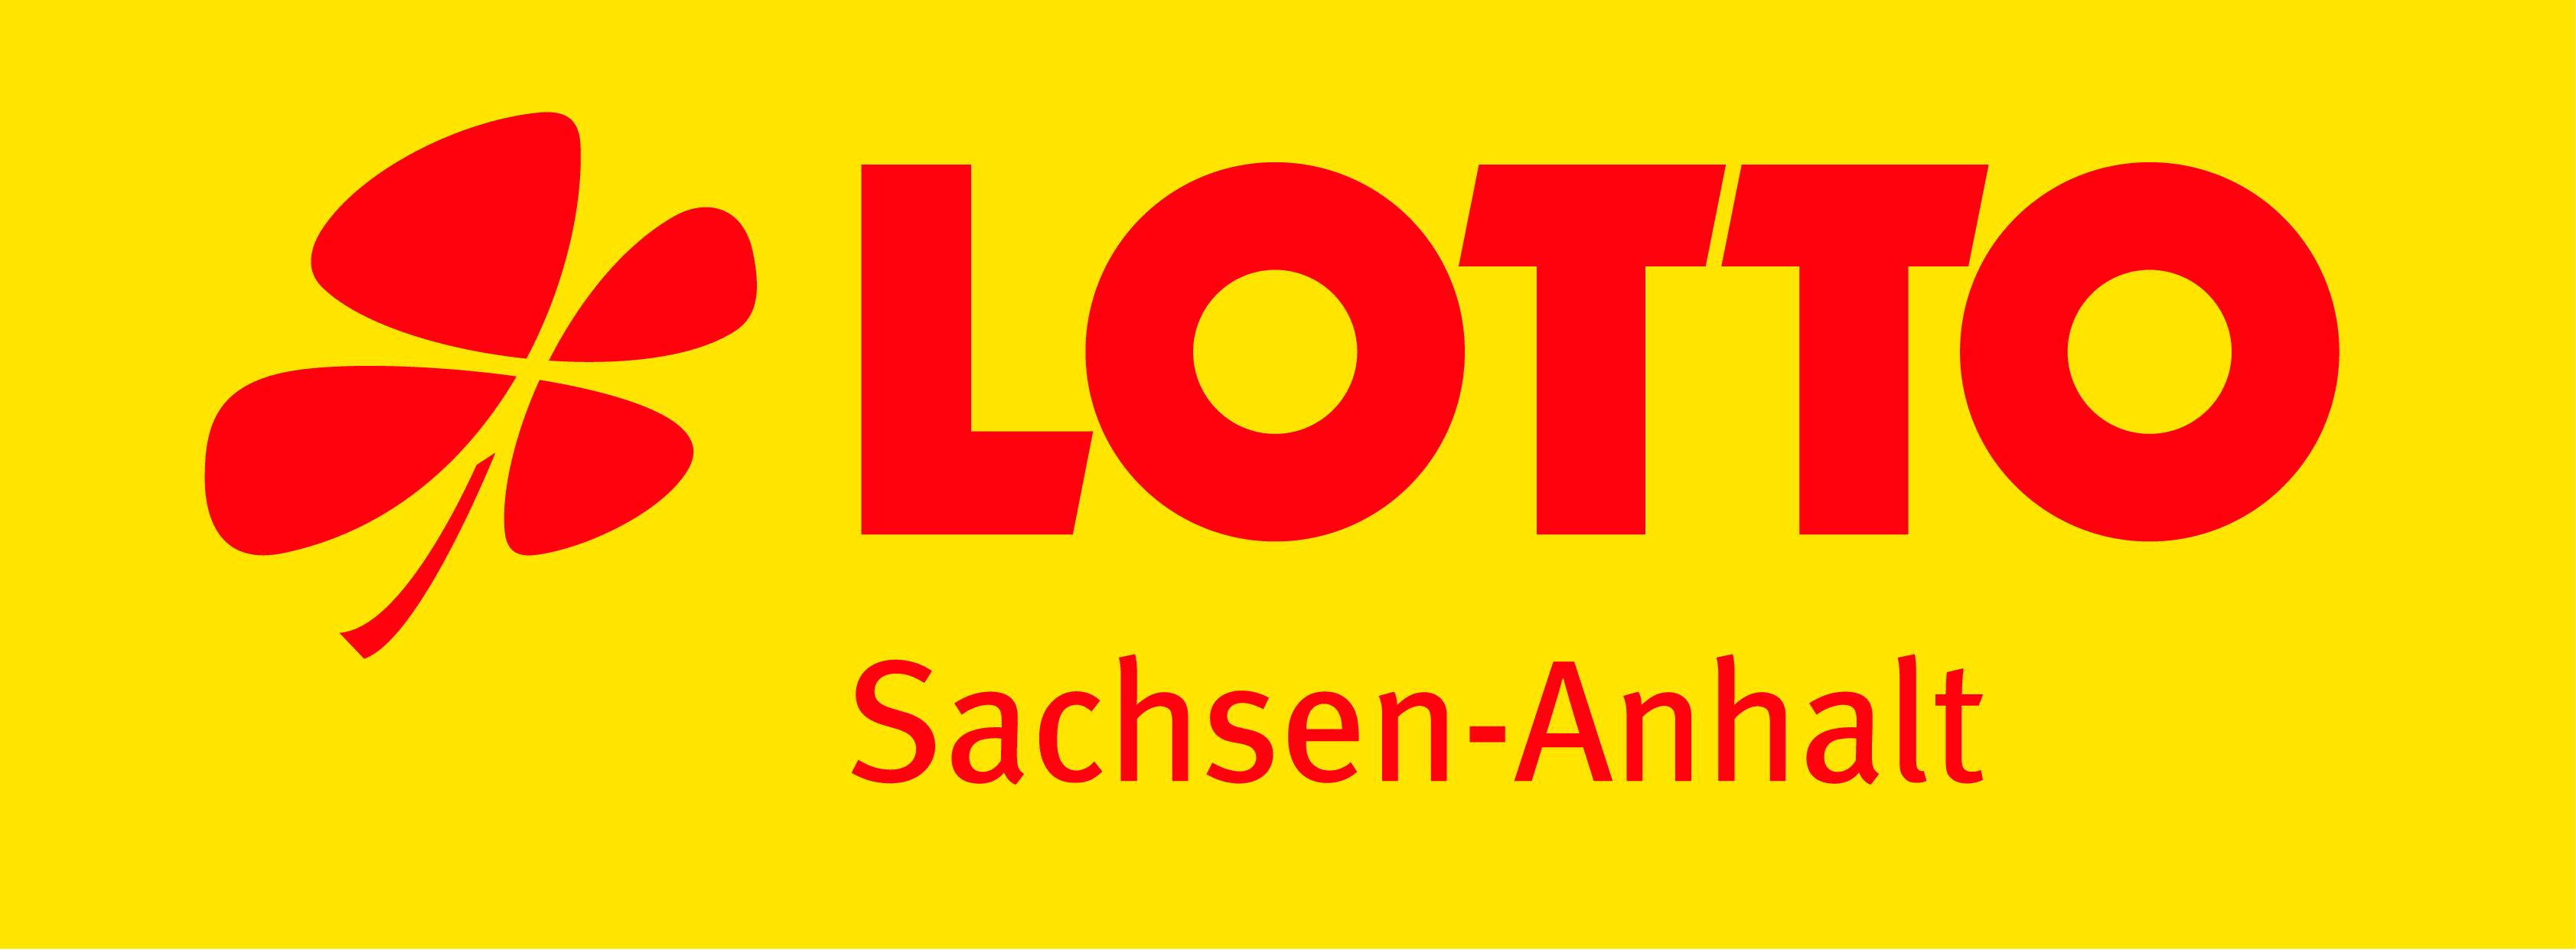 Lotto Sachsen- Anhalt fördert wieder großzügig